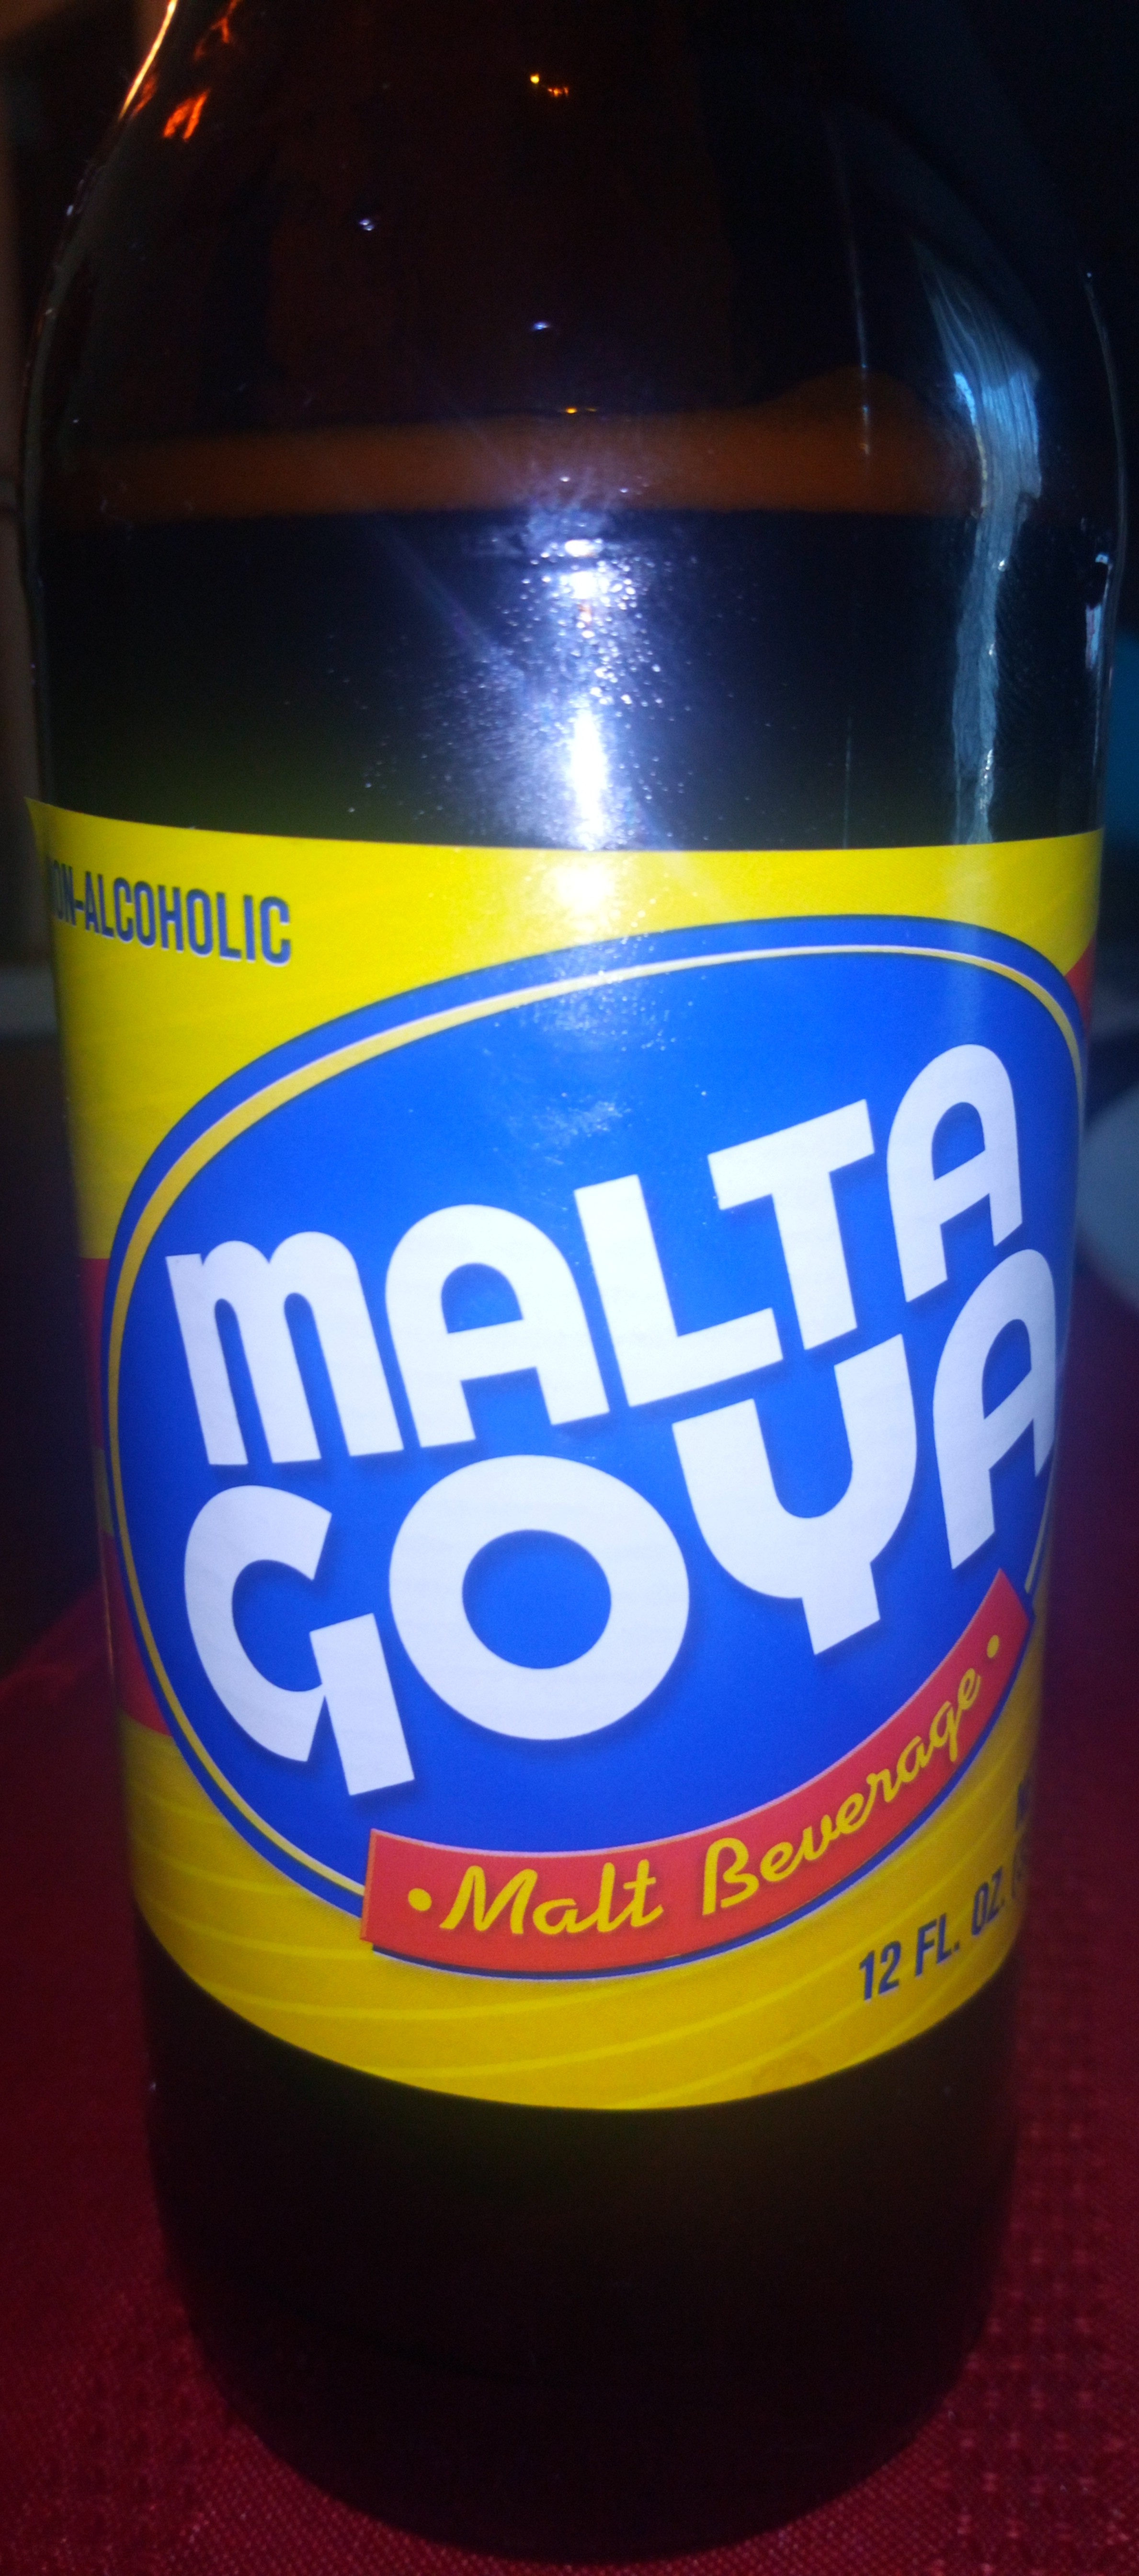 Malta Goya, Malt Beverage, Non-Alcholic - Product